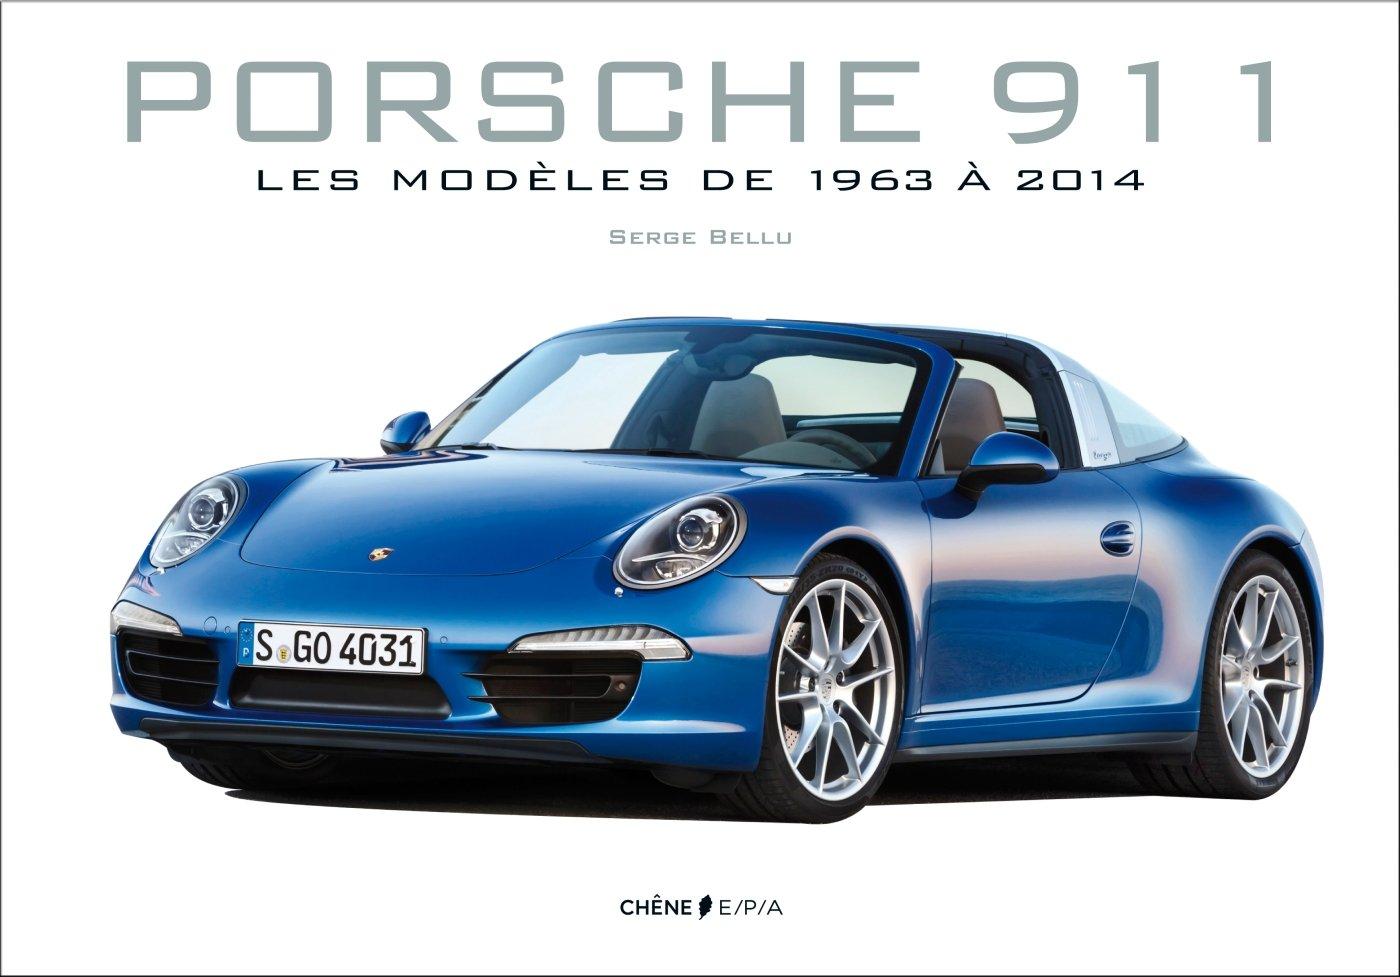 Porsche 911 NED complétée (Transports): Amazon.es: Serge Bellu: Libros en idiomas extranjeros